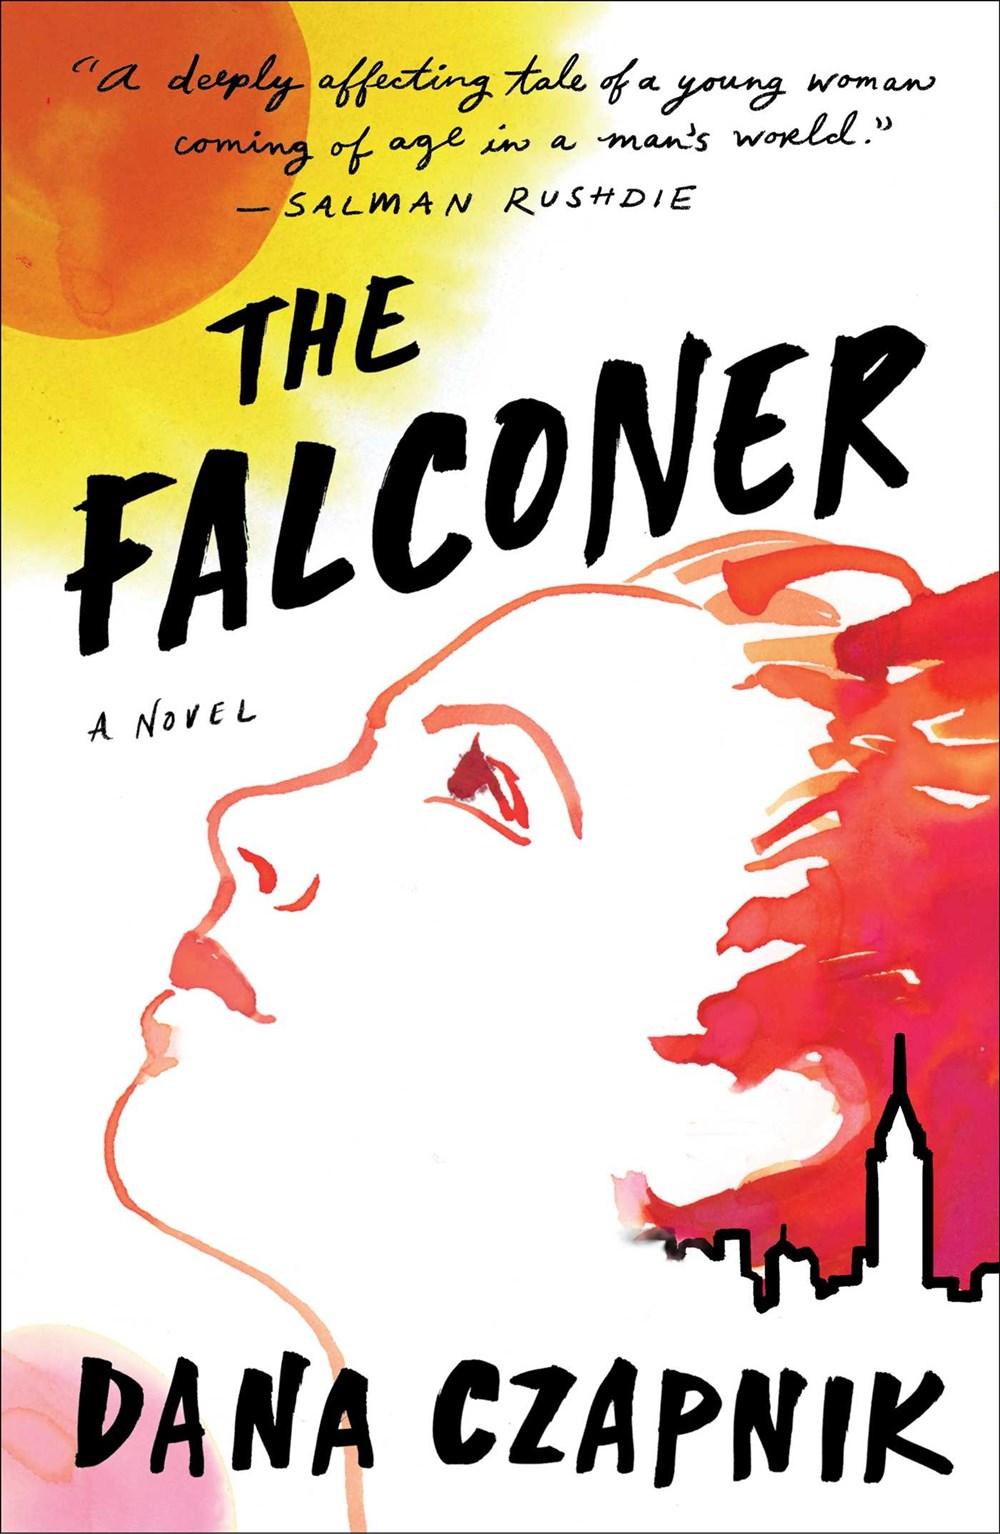 the falconer.jpg